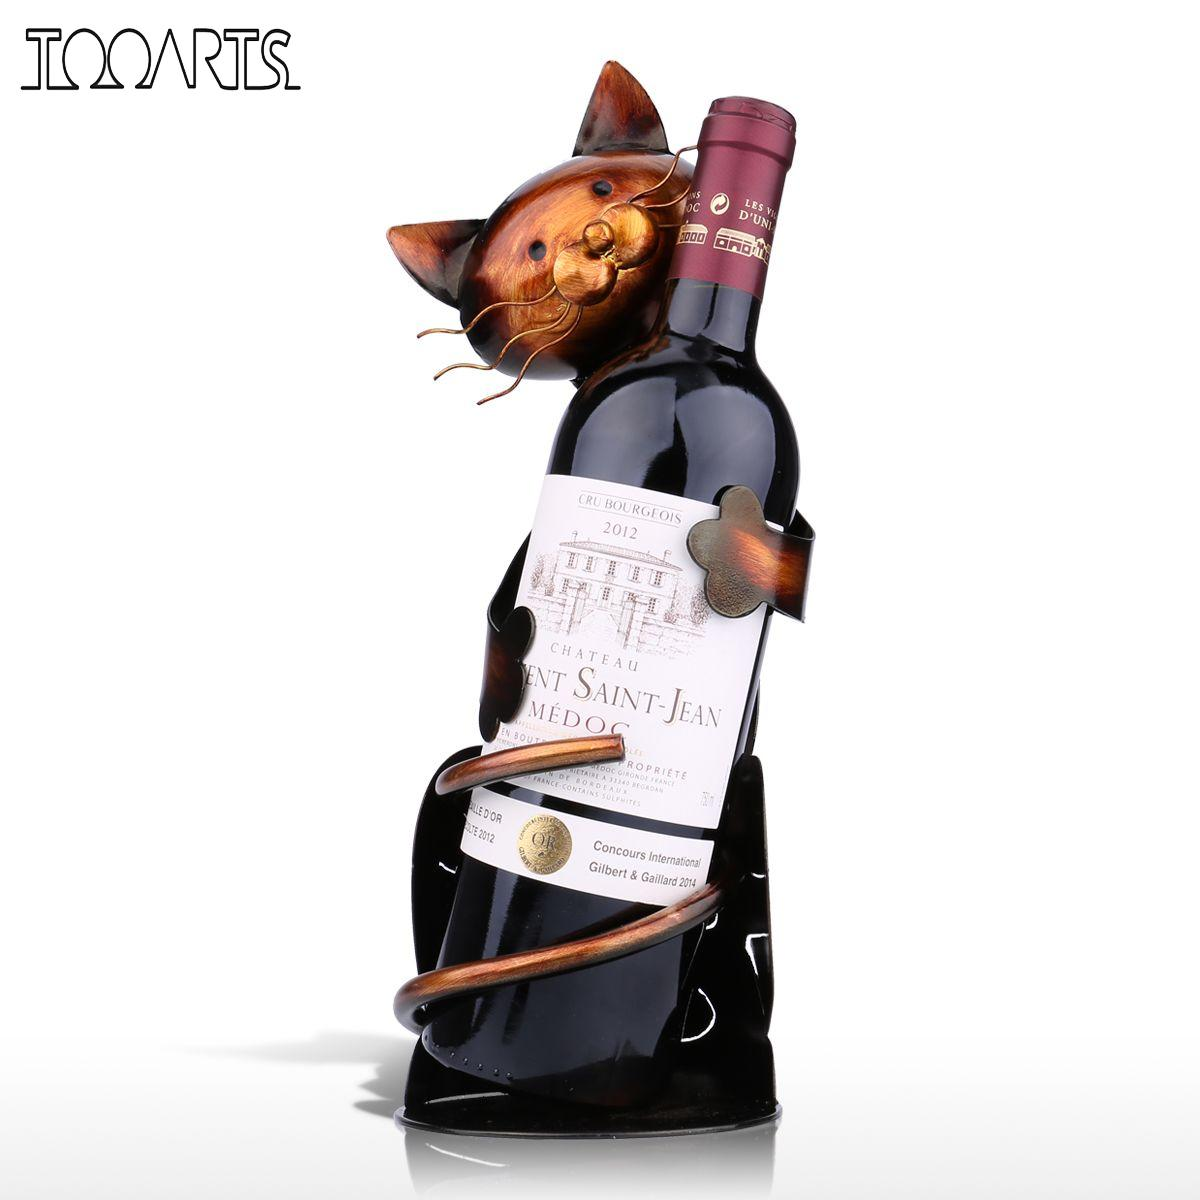 TOOARTS Cat Wine Rack Wine Holder Shelf Metal Sculpture Practical Sculpture Wine stand Home Decoration Interior